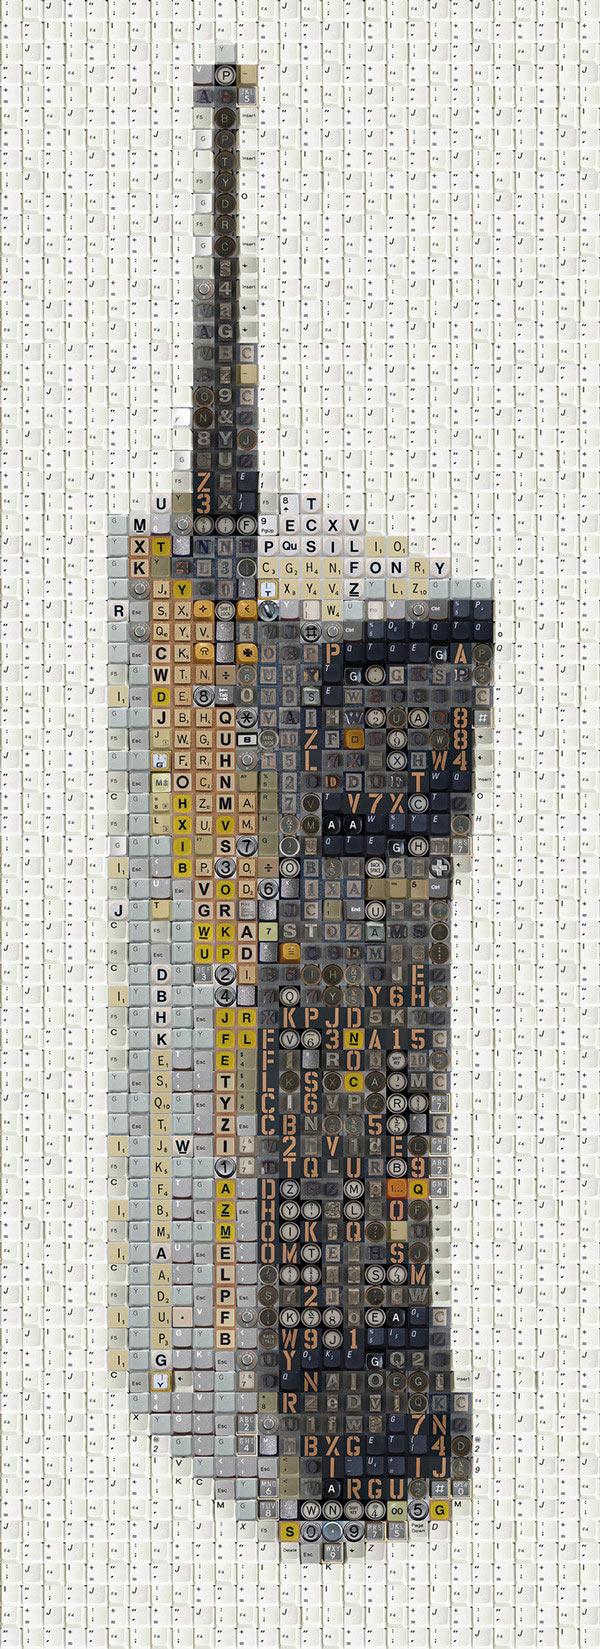 Retro-Elektronik aus Tastatur-Tasten Old_School_80s_Electronica_07